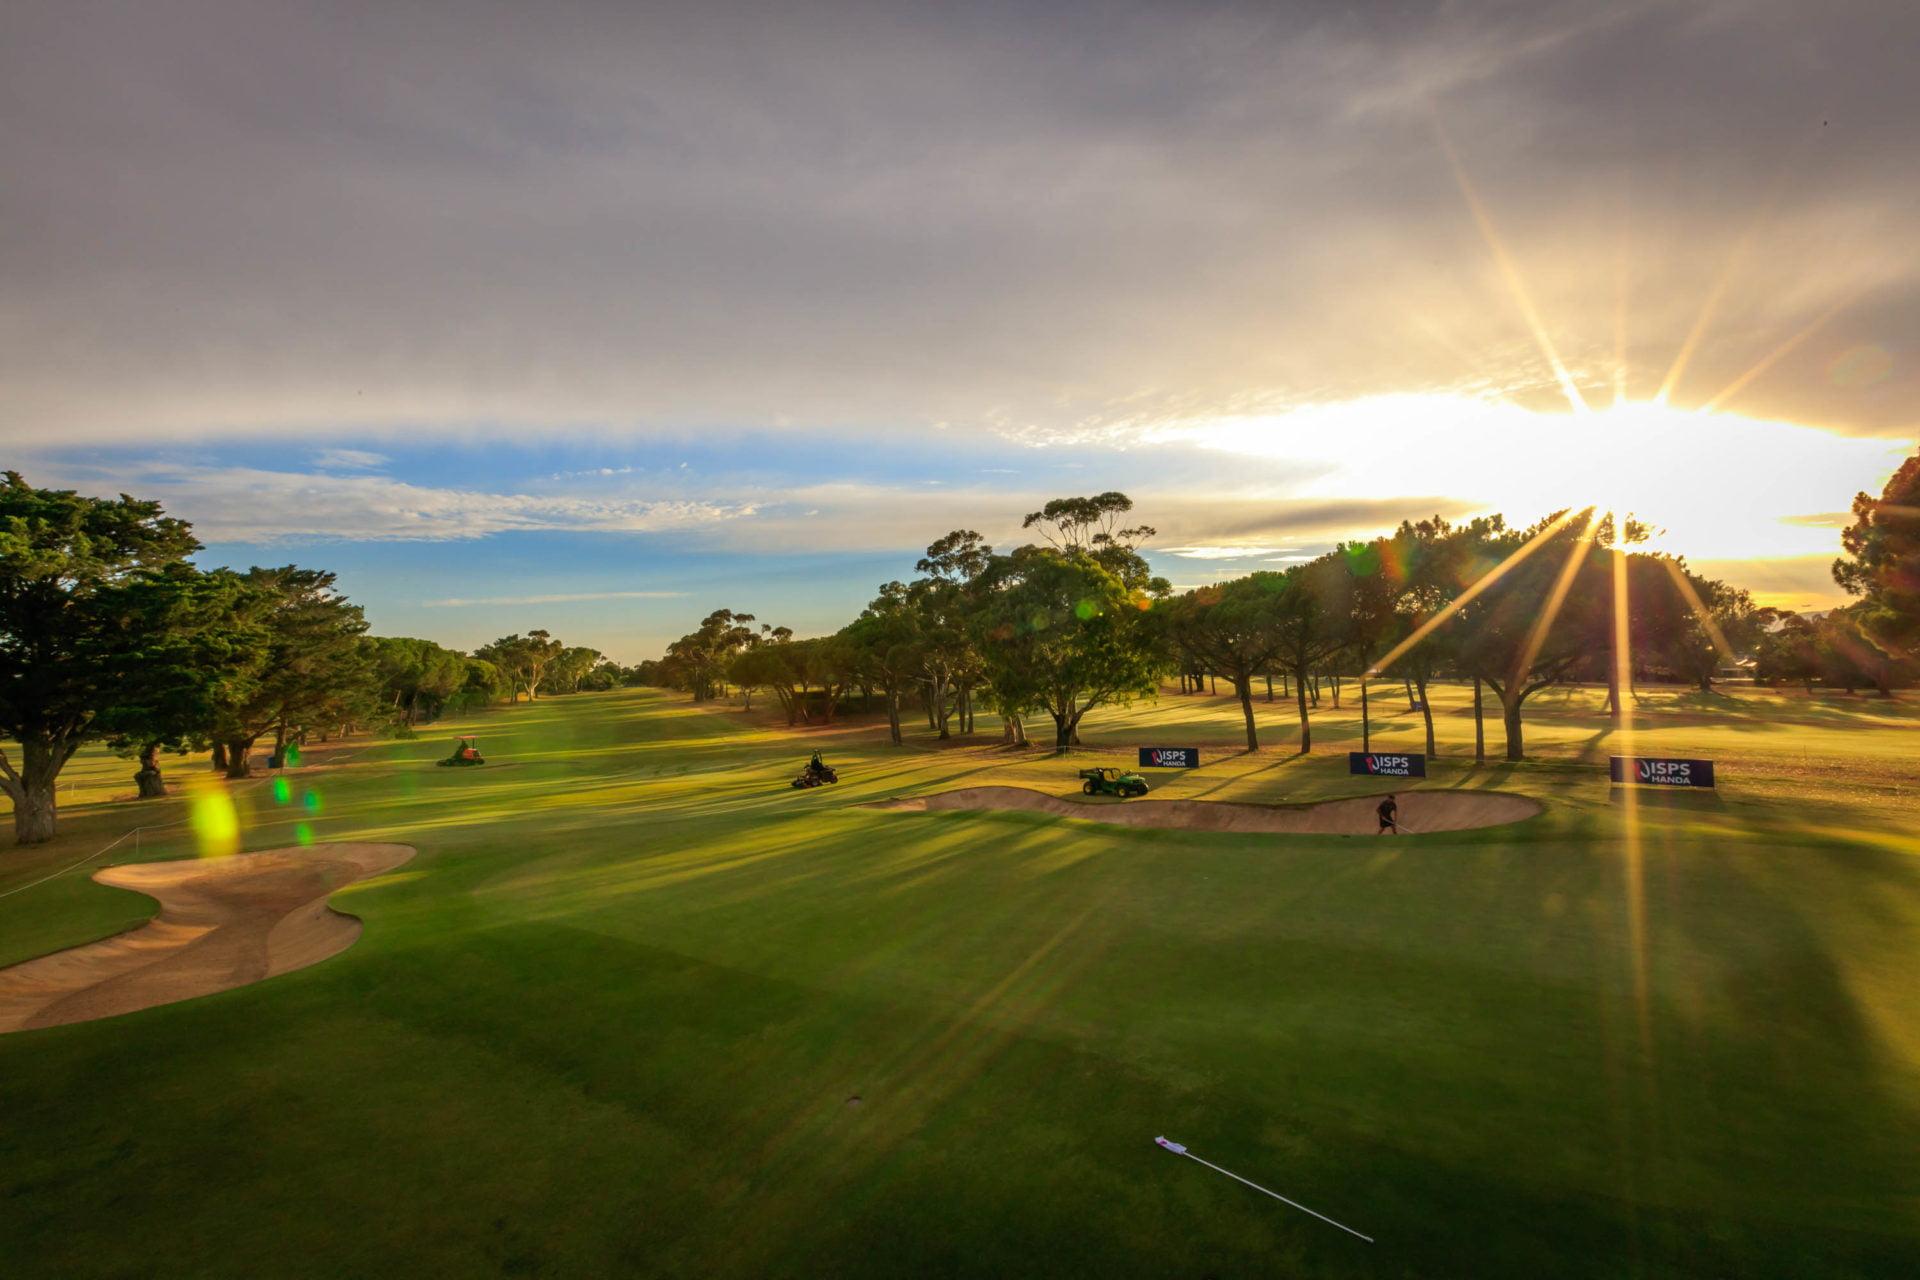 2019 Women's Australian Open - early morning image of golf course